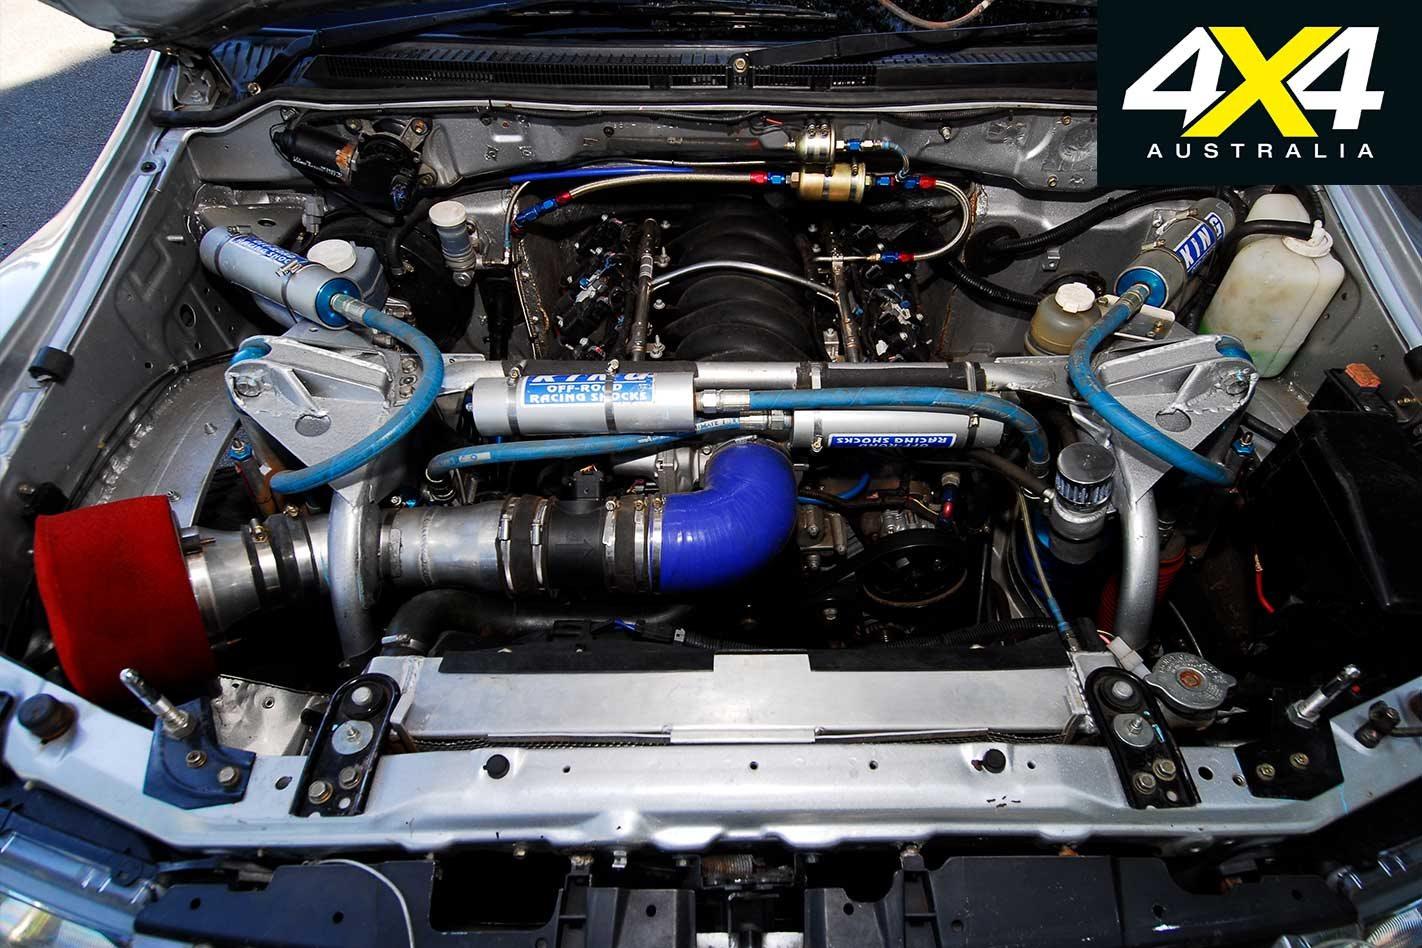 2008 Mitsubishi Pajero Safari Rally 4x4 review